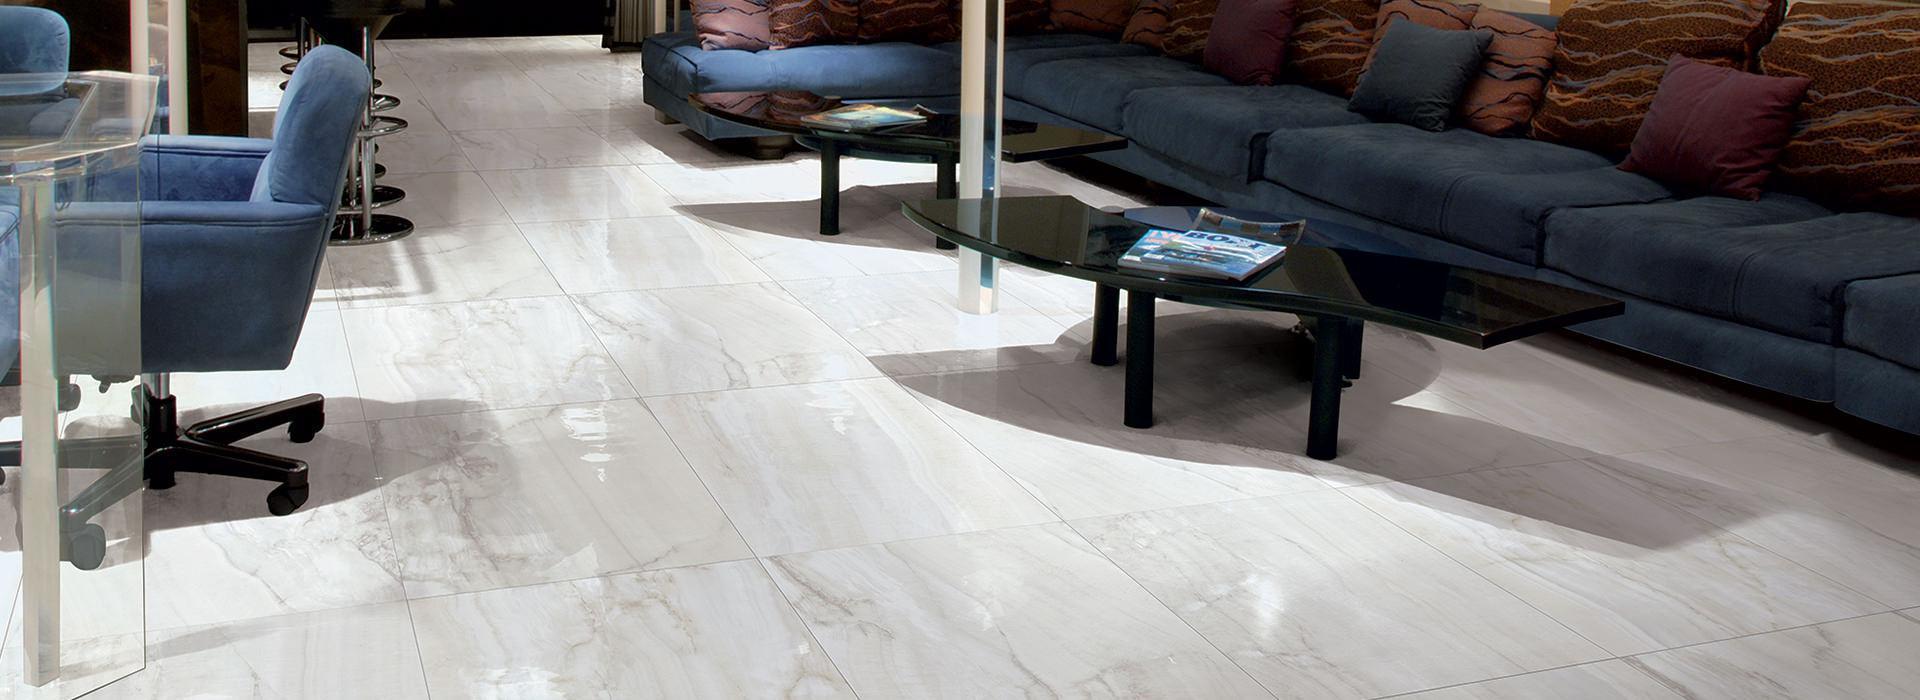 Onice perla onici white marble effect porcelain tiles maxfine onici dailygadgetfo Gallery